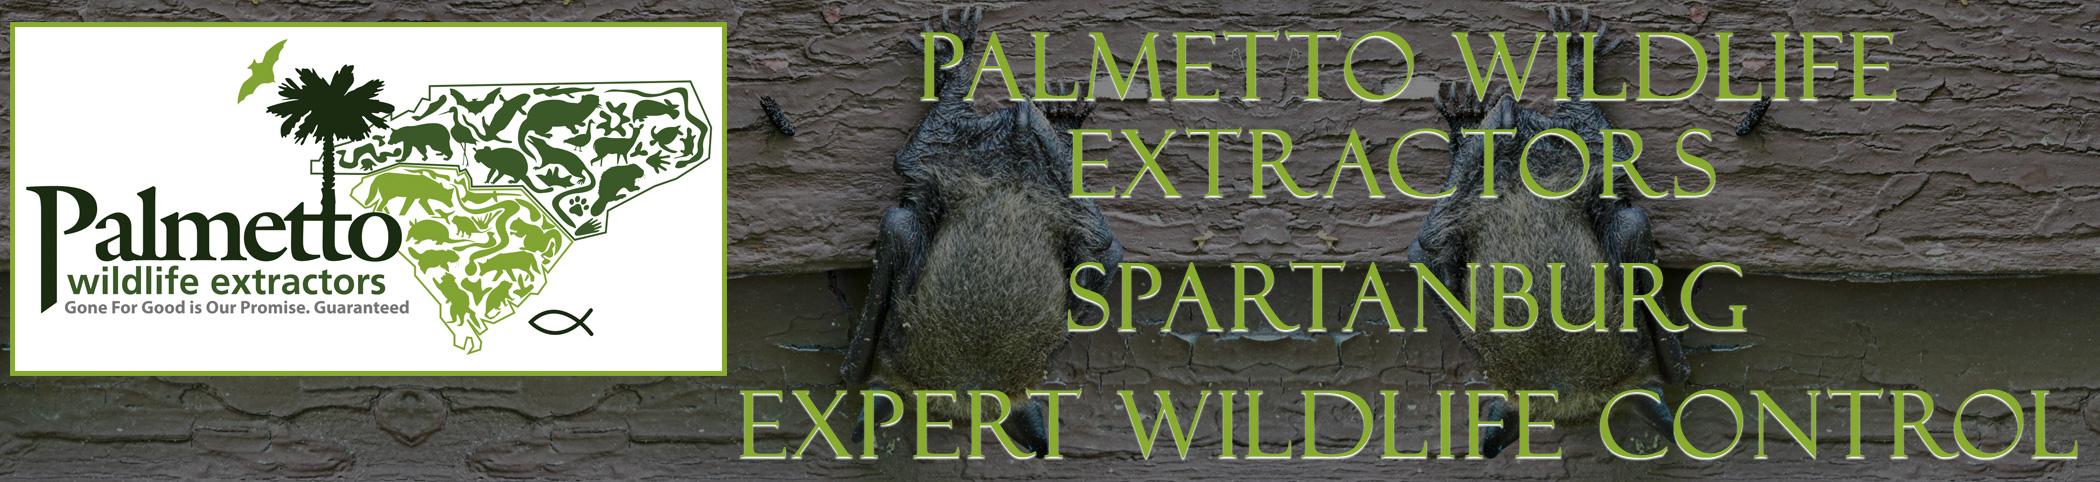 Palmetto Wildlife Extractors spartanburg south carolina header image